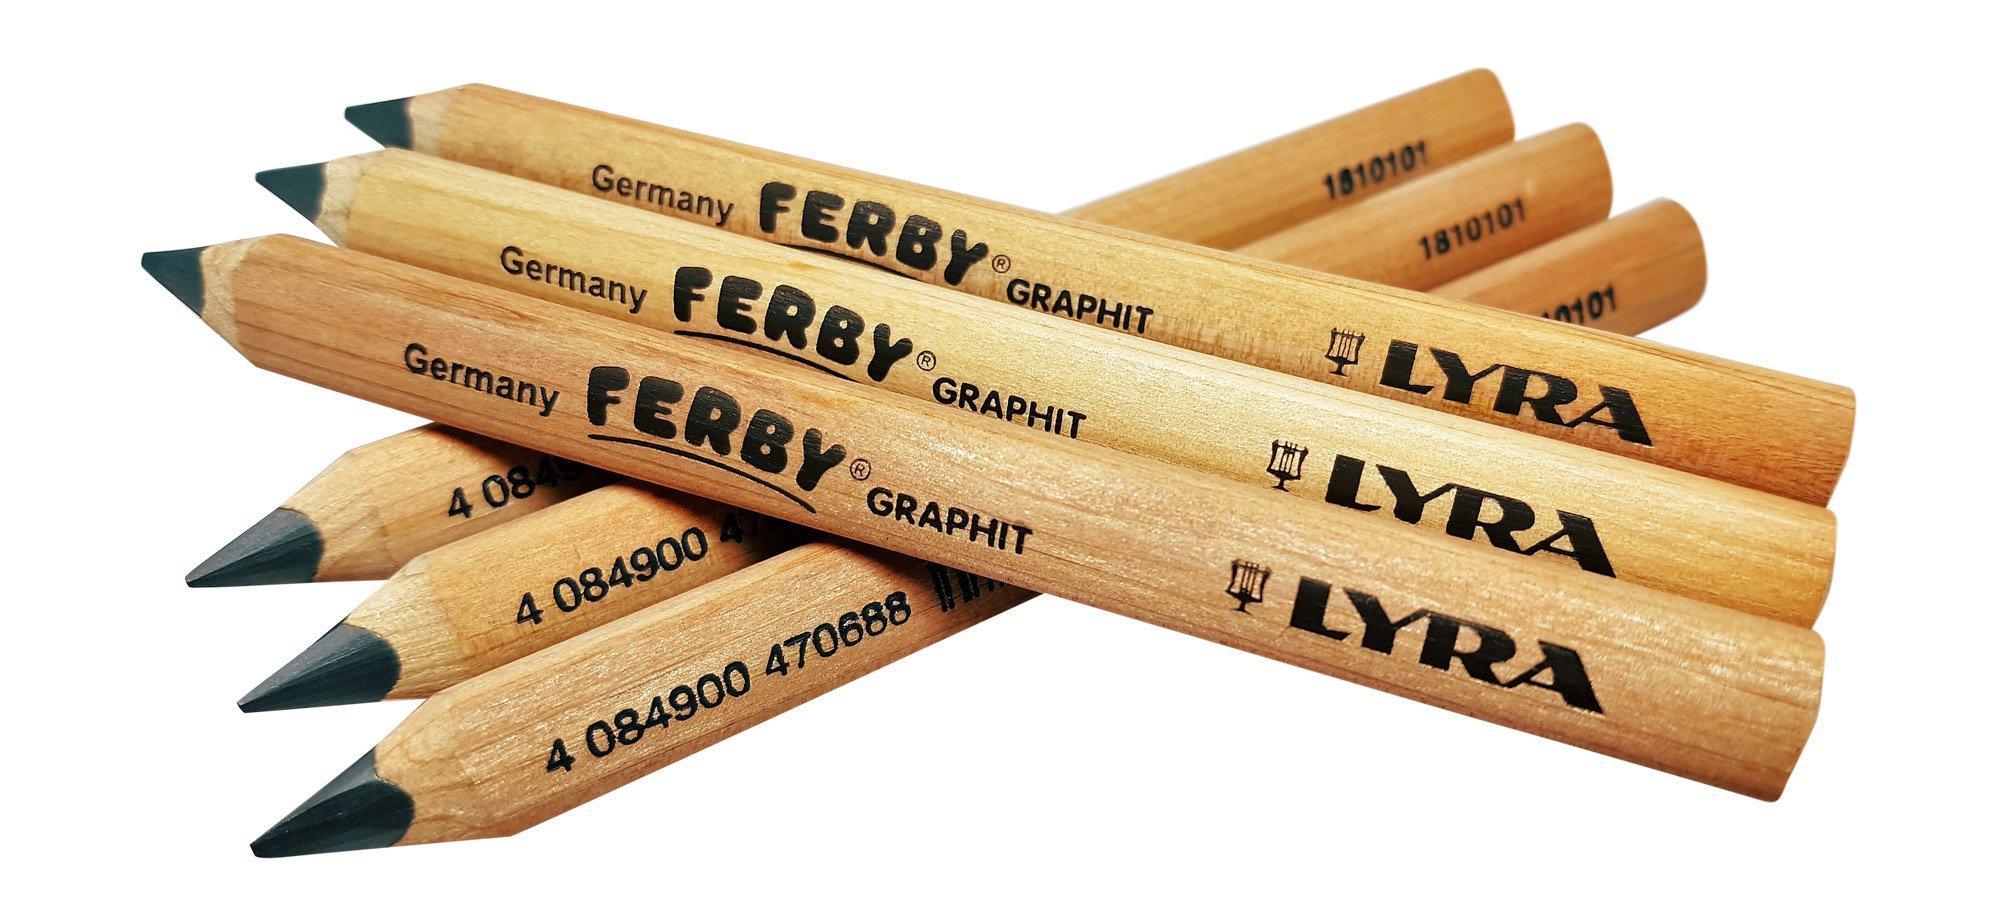 6 Lapices Lyra (alemanes) para niños